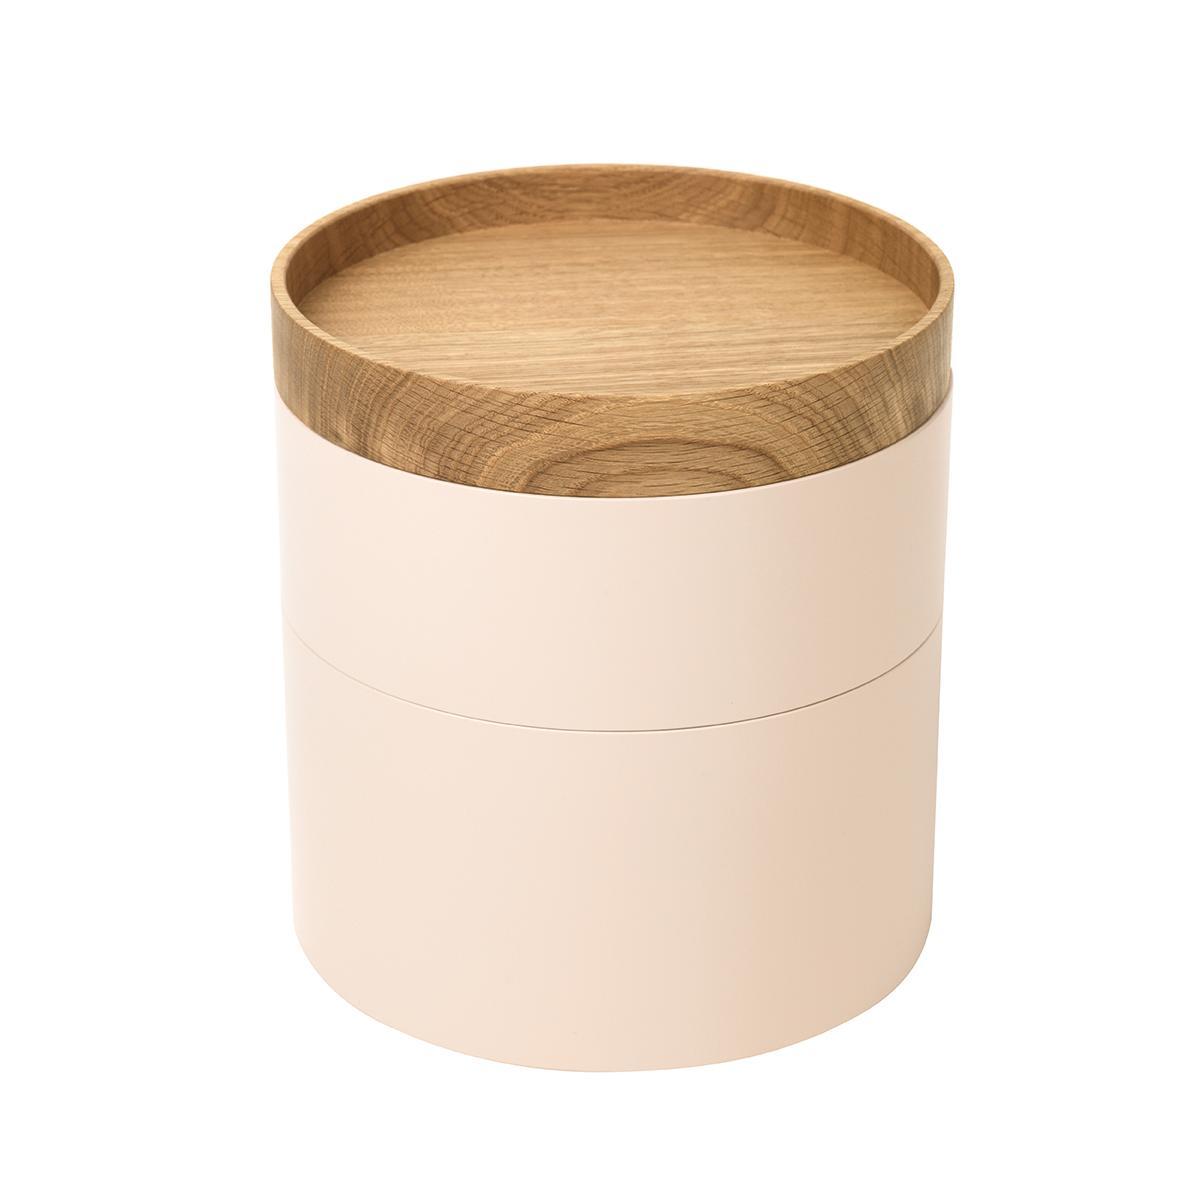 CAPSULE Holzdosen 2er-Set Lack vanille / Deckel Eiche natur geölt